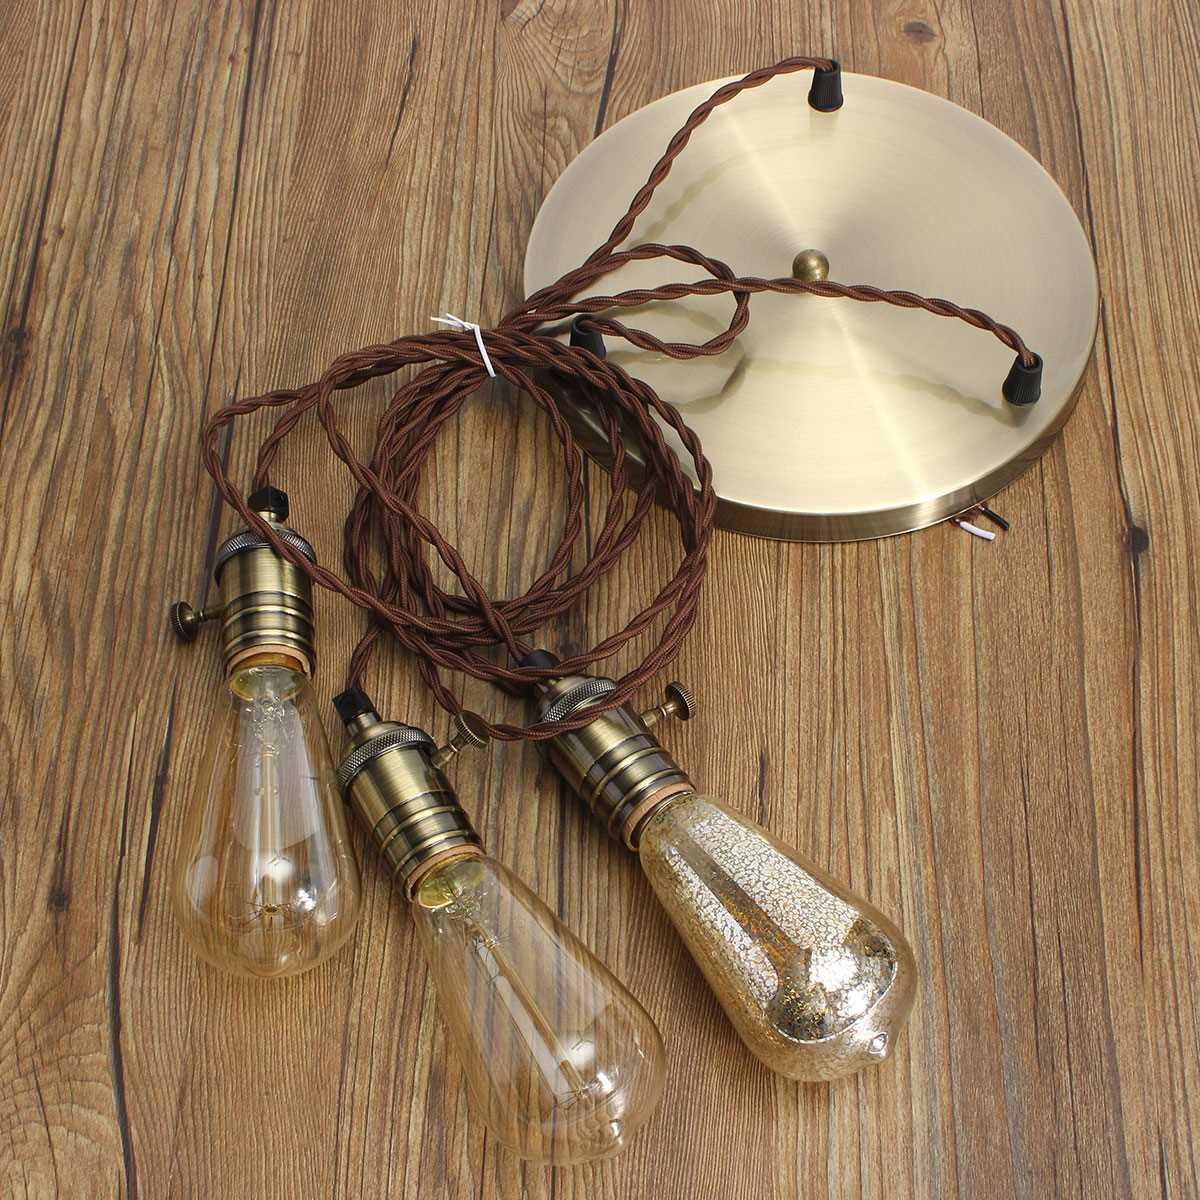 Lampensockel E27 Retro Vintage Industrie Loft Anhänger Decken Edison Licht Lampensockel Halter Hängen Lampenschirm Steckdose Mit Schalter